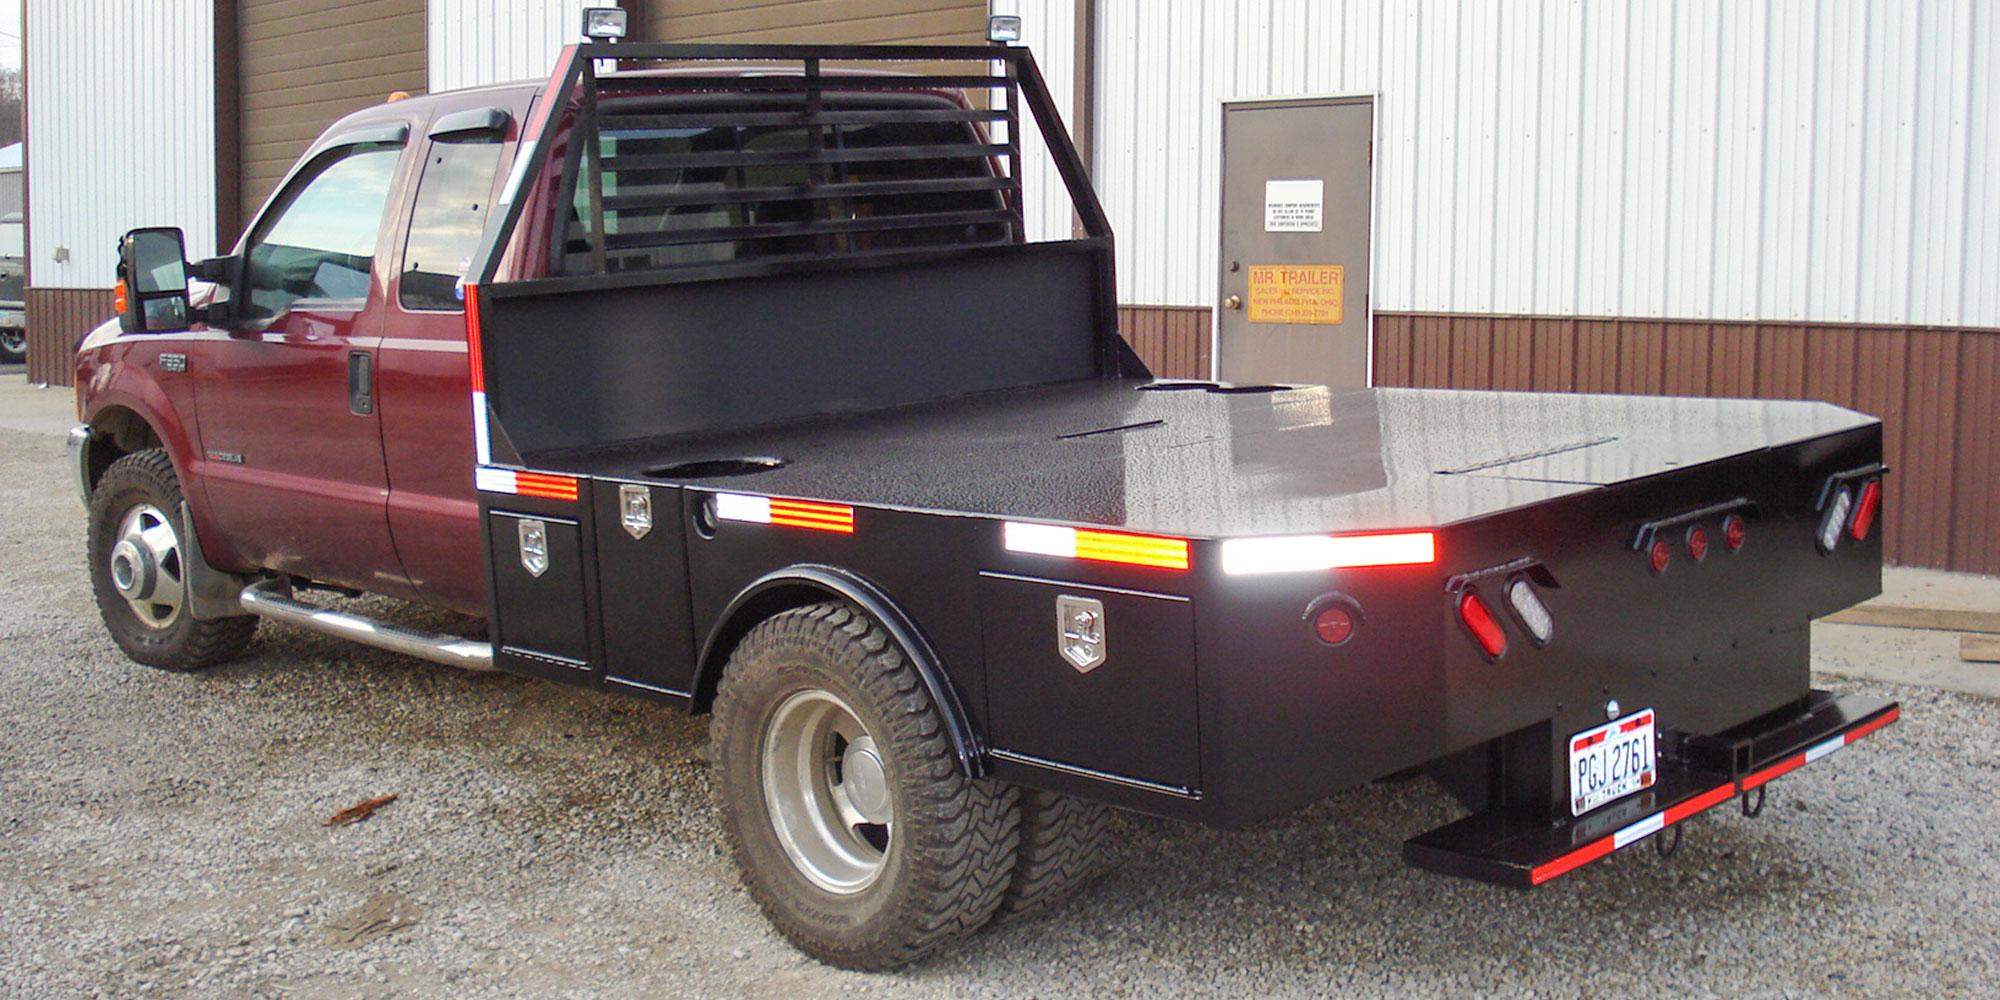 Truck Beds And Custom Fabrication Mr Trailer Sales New Philadelphia Ohio Moritz